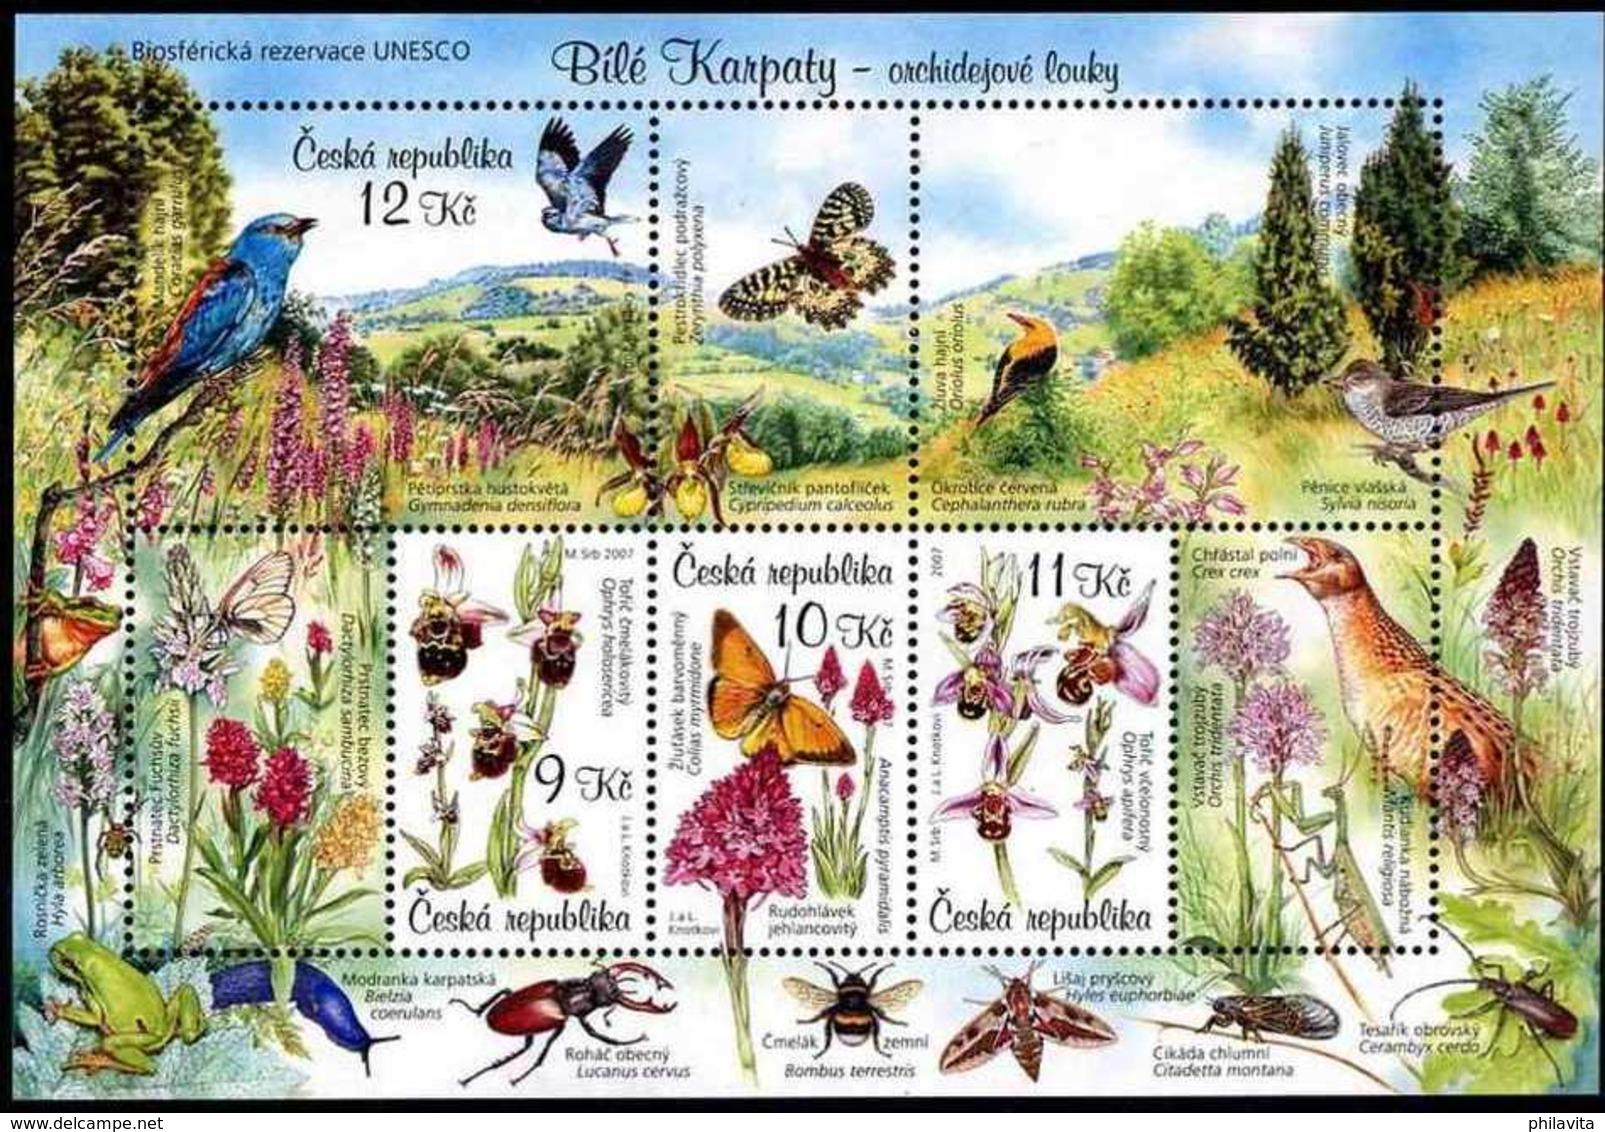 2007 Czech  Biosphere Reserve UNESCO Bile Karpaty - MNH ** Mi B 28 Songbirds, Butterfly, Flowers, Orchids - Repubblica Ceca